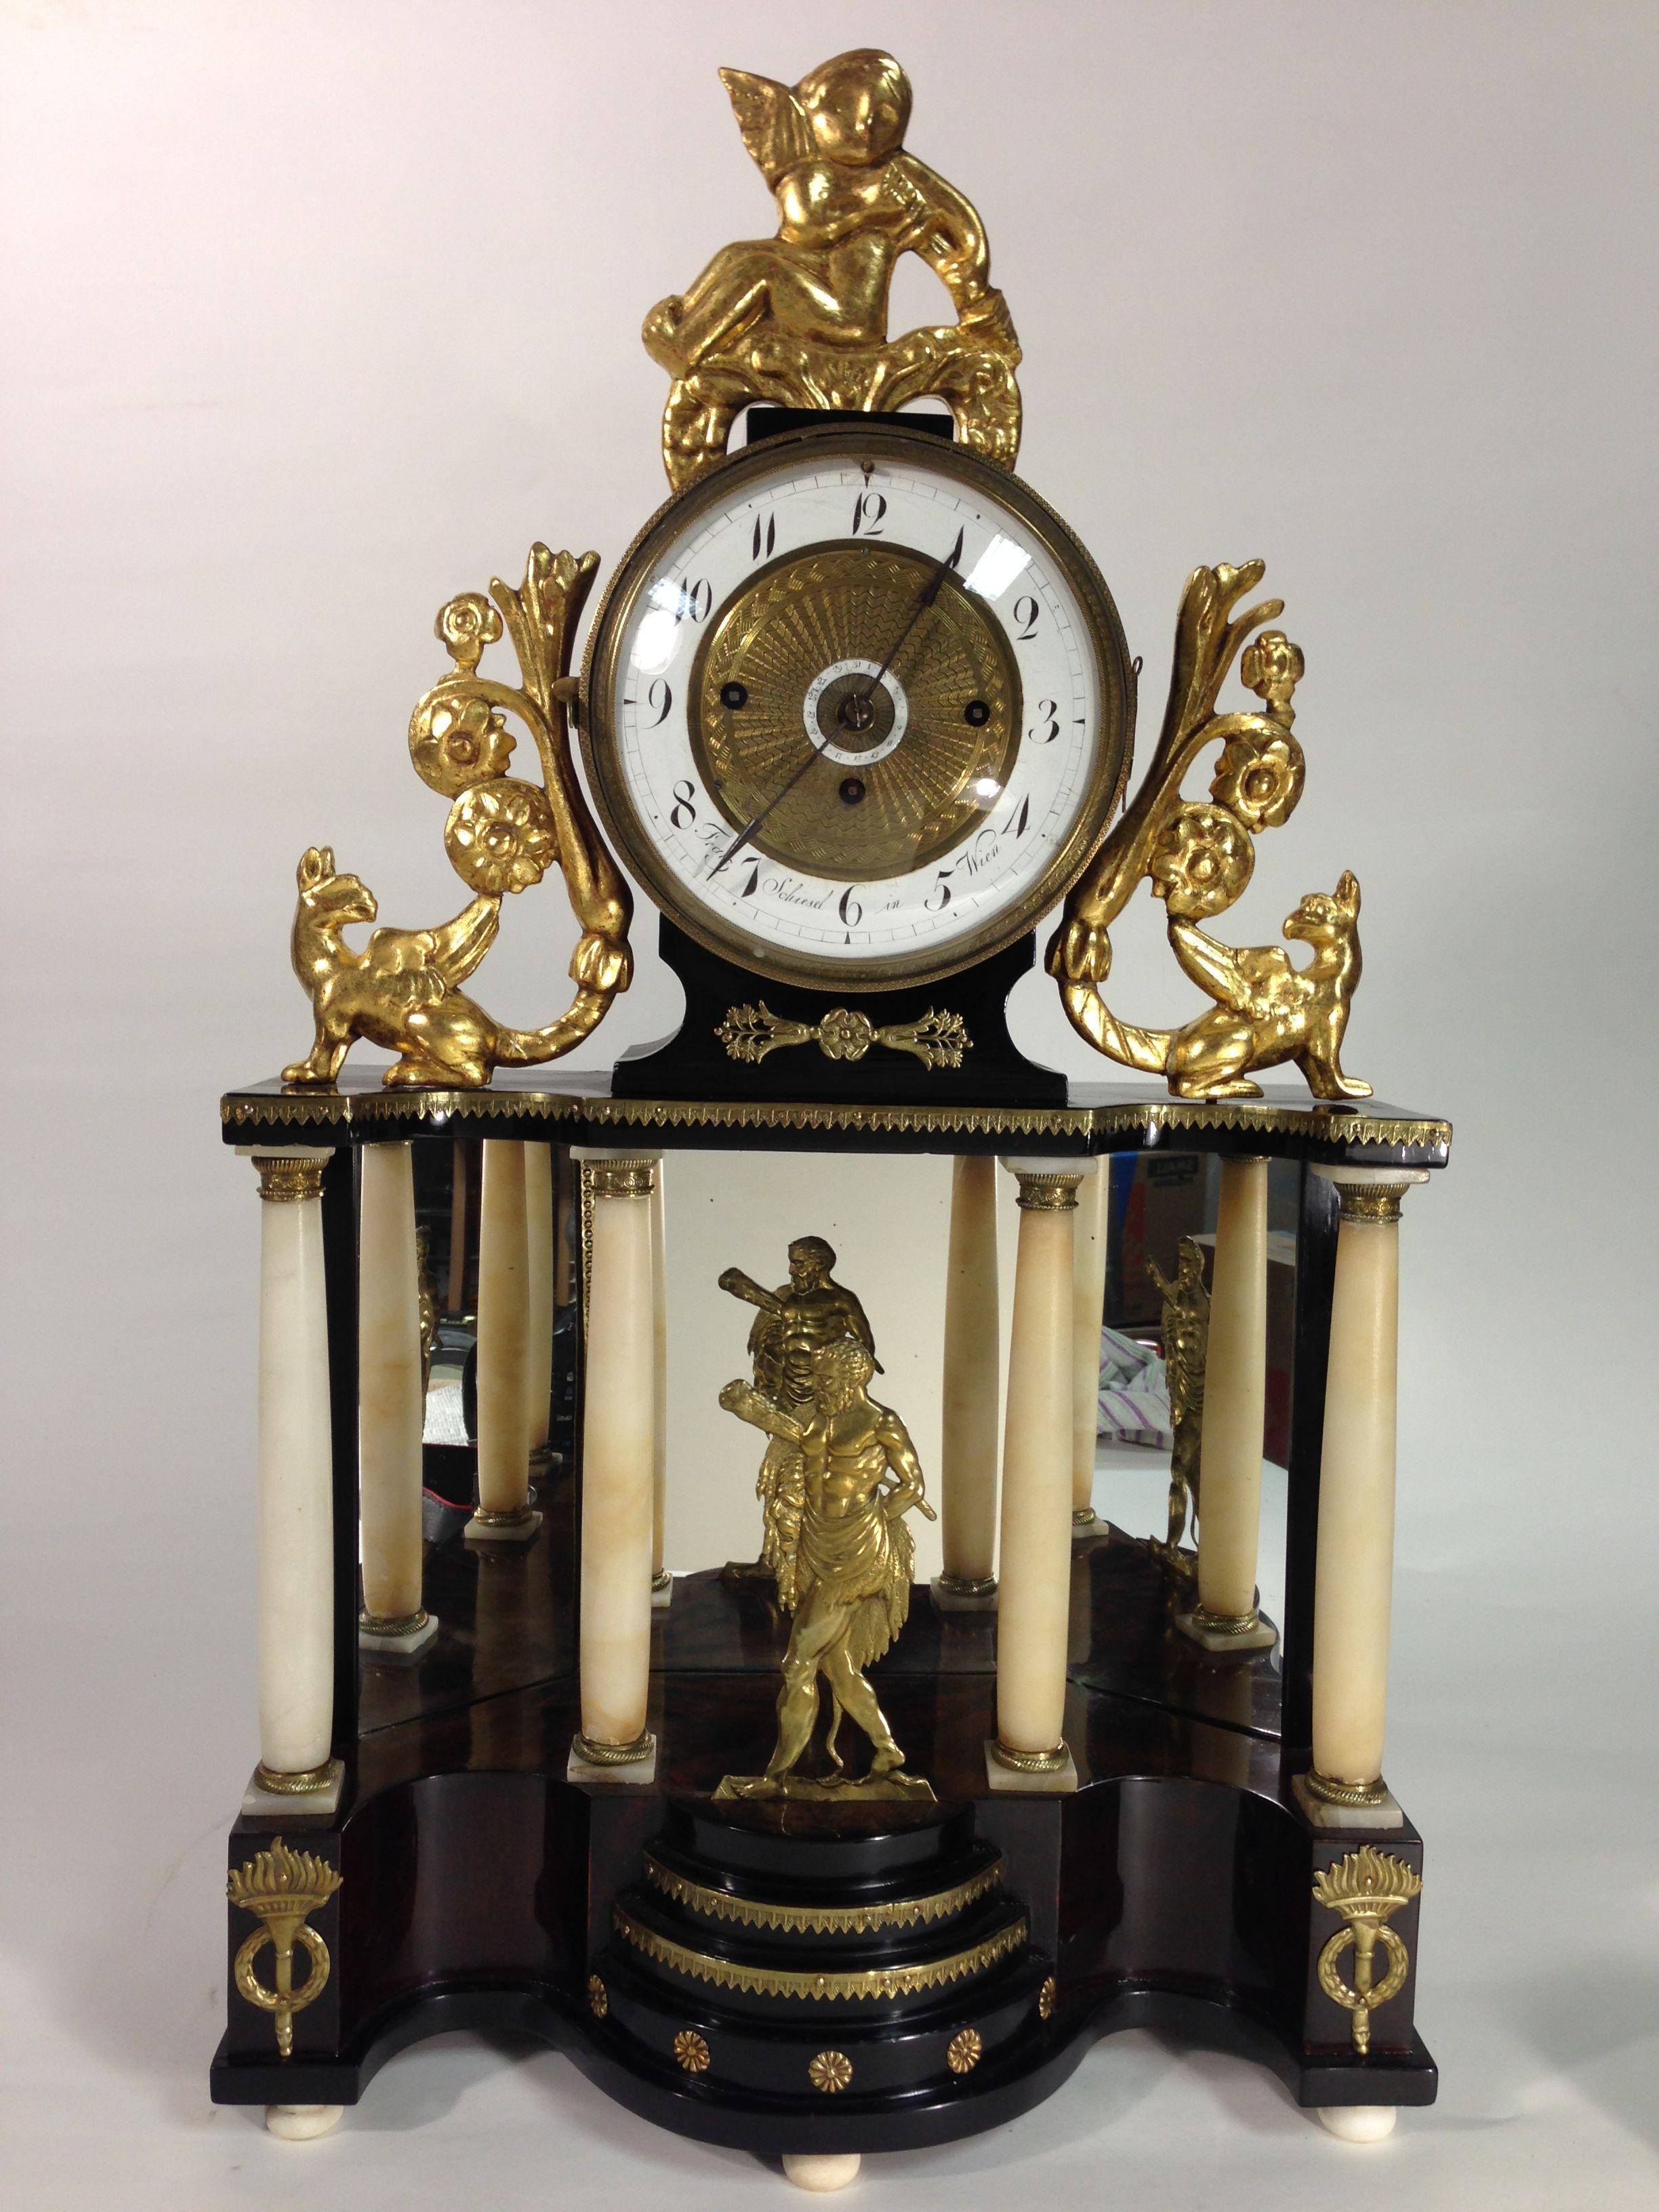 Biedermeier Mantel Clock 1 4 Hour Strike With Date Vienna